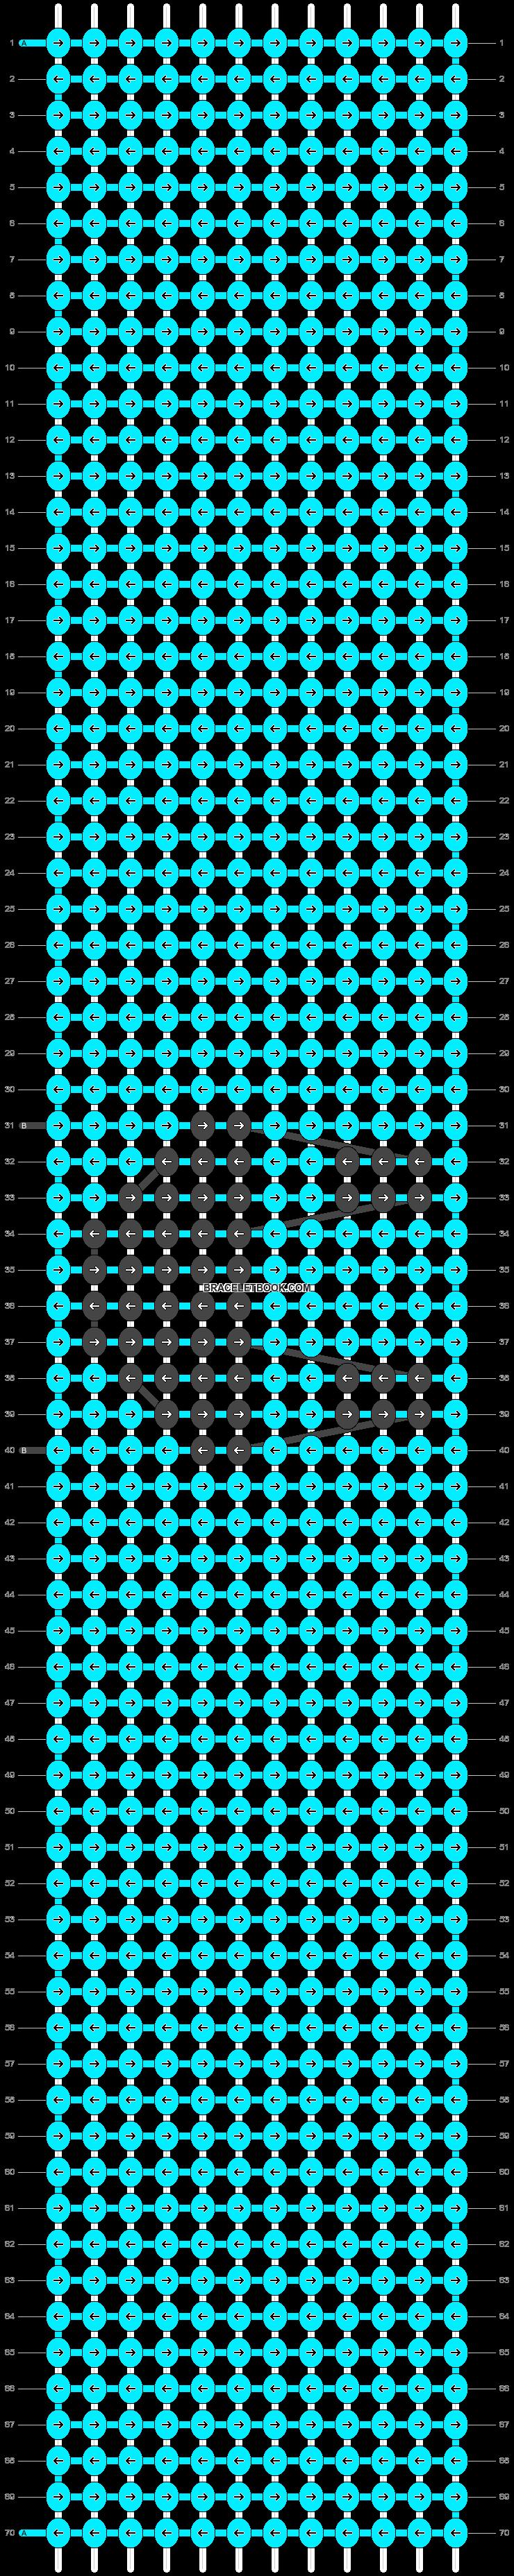 Alpha pattern #93686 pattern